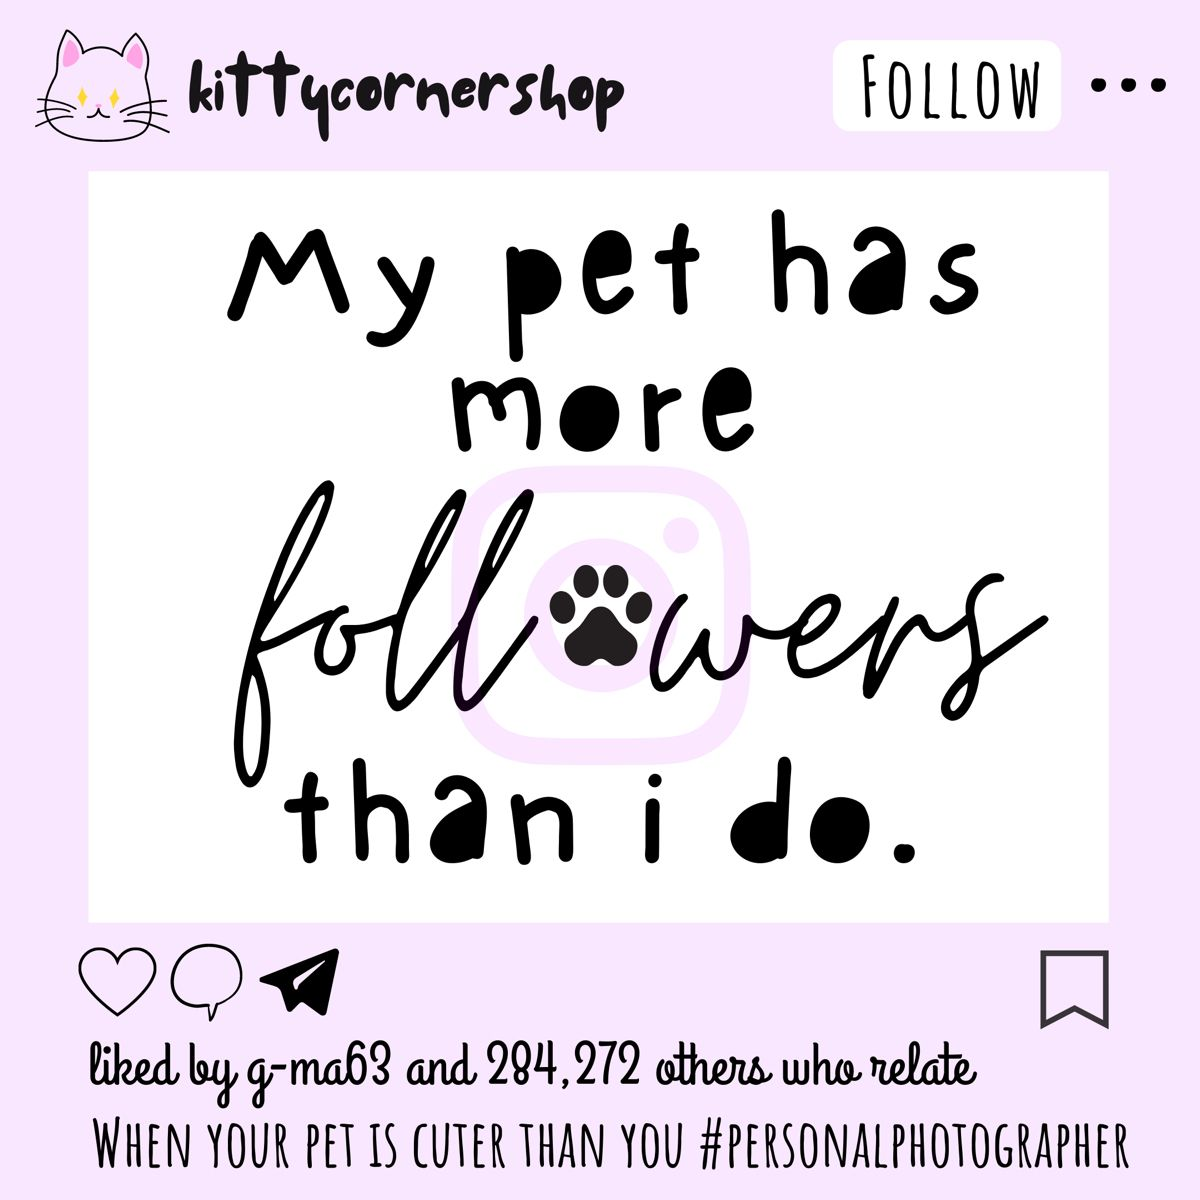 Instagram Magnet In 2020 Cat Rescue Shelter Pet Supply Stores Handmade Pet